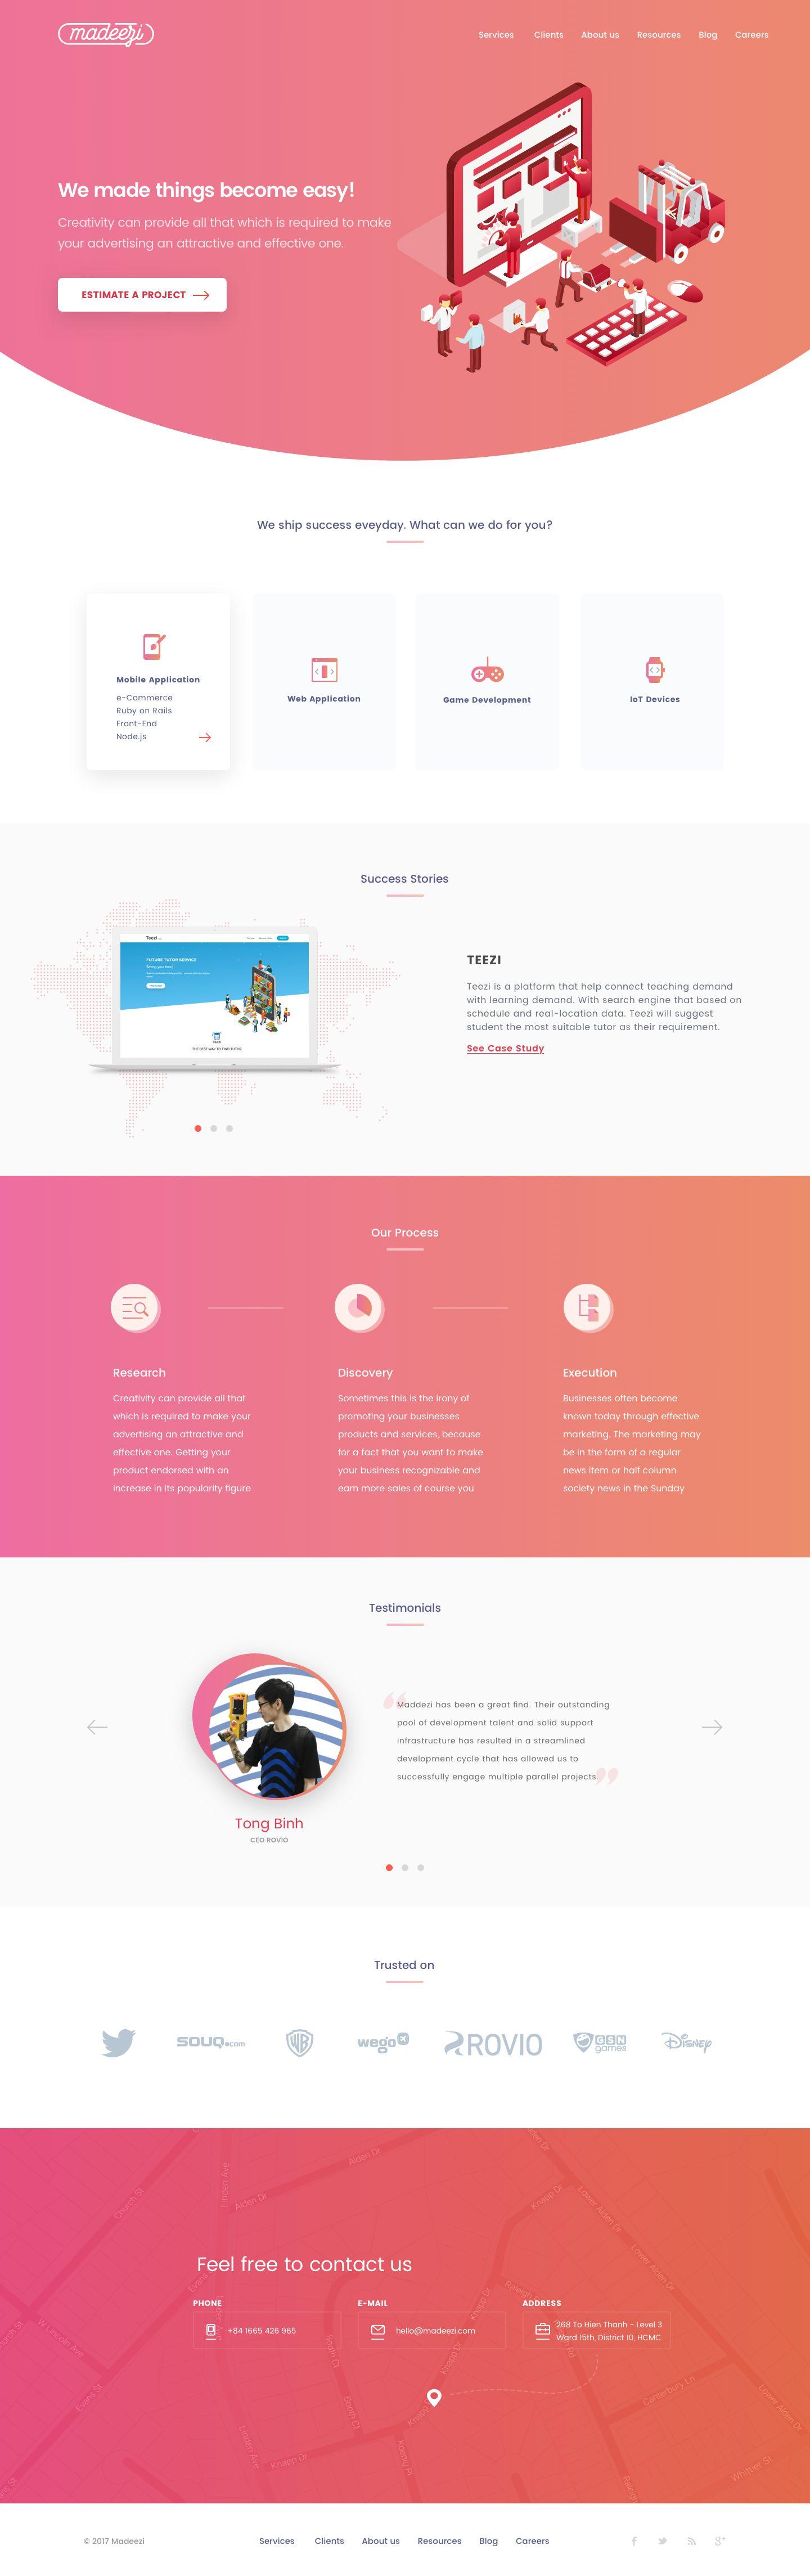 Desktop Hd Web App Design Css Tutorial Agency Website Design